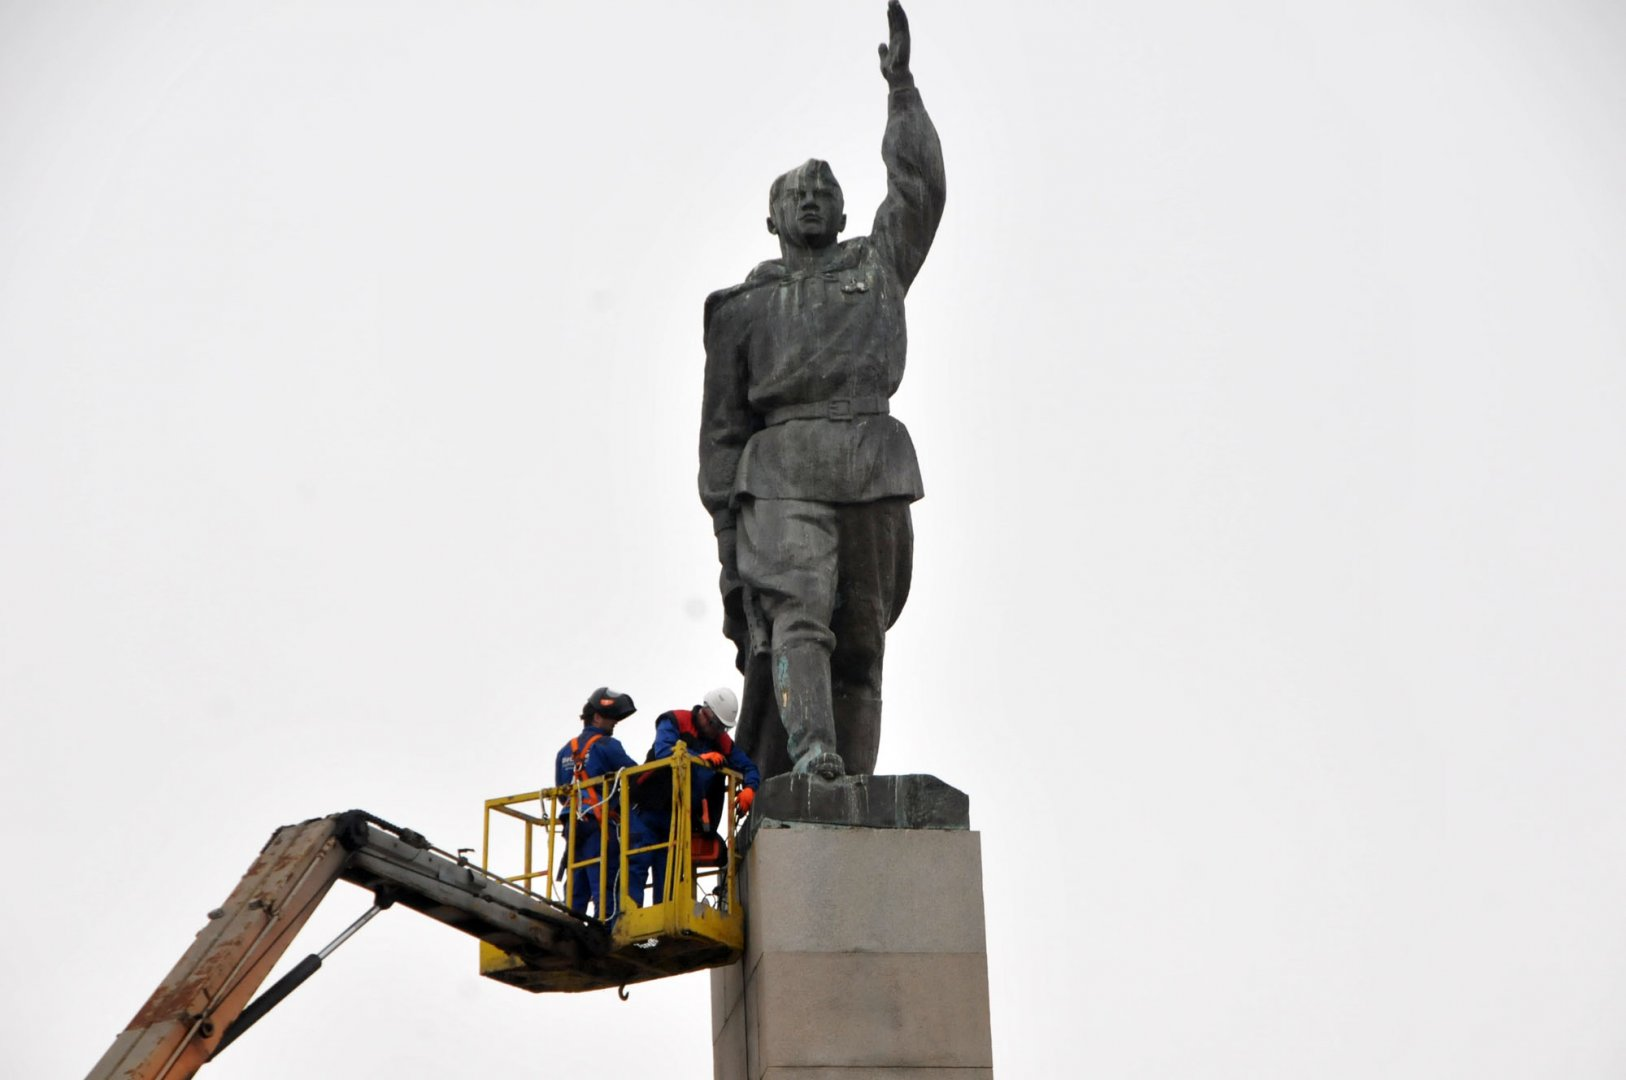 Работници ремонтират паметника Альоша на площад Тройката - Бургас. Снимка Лина Главинова